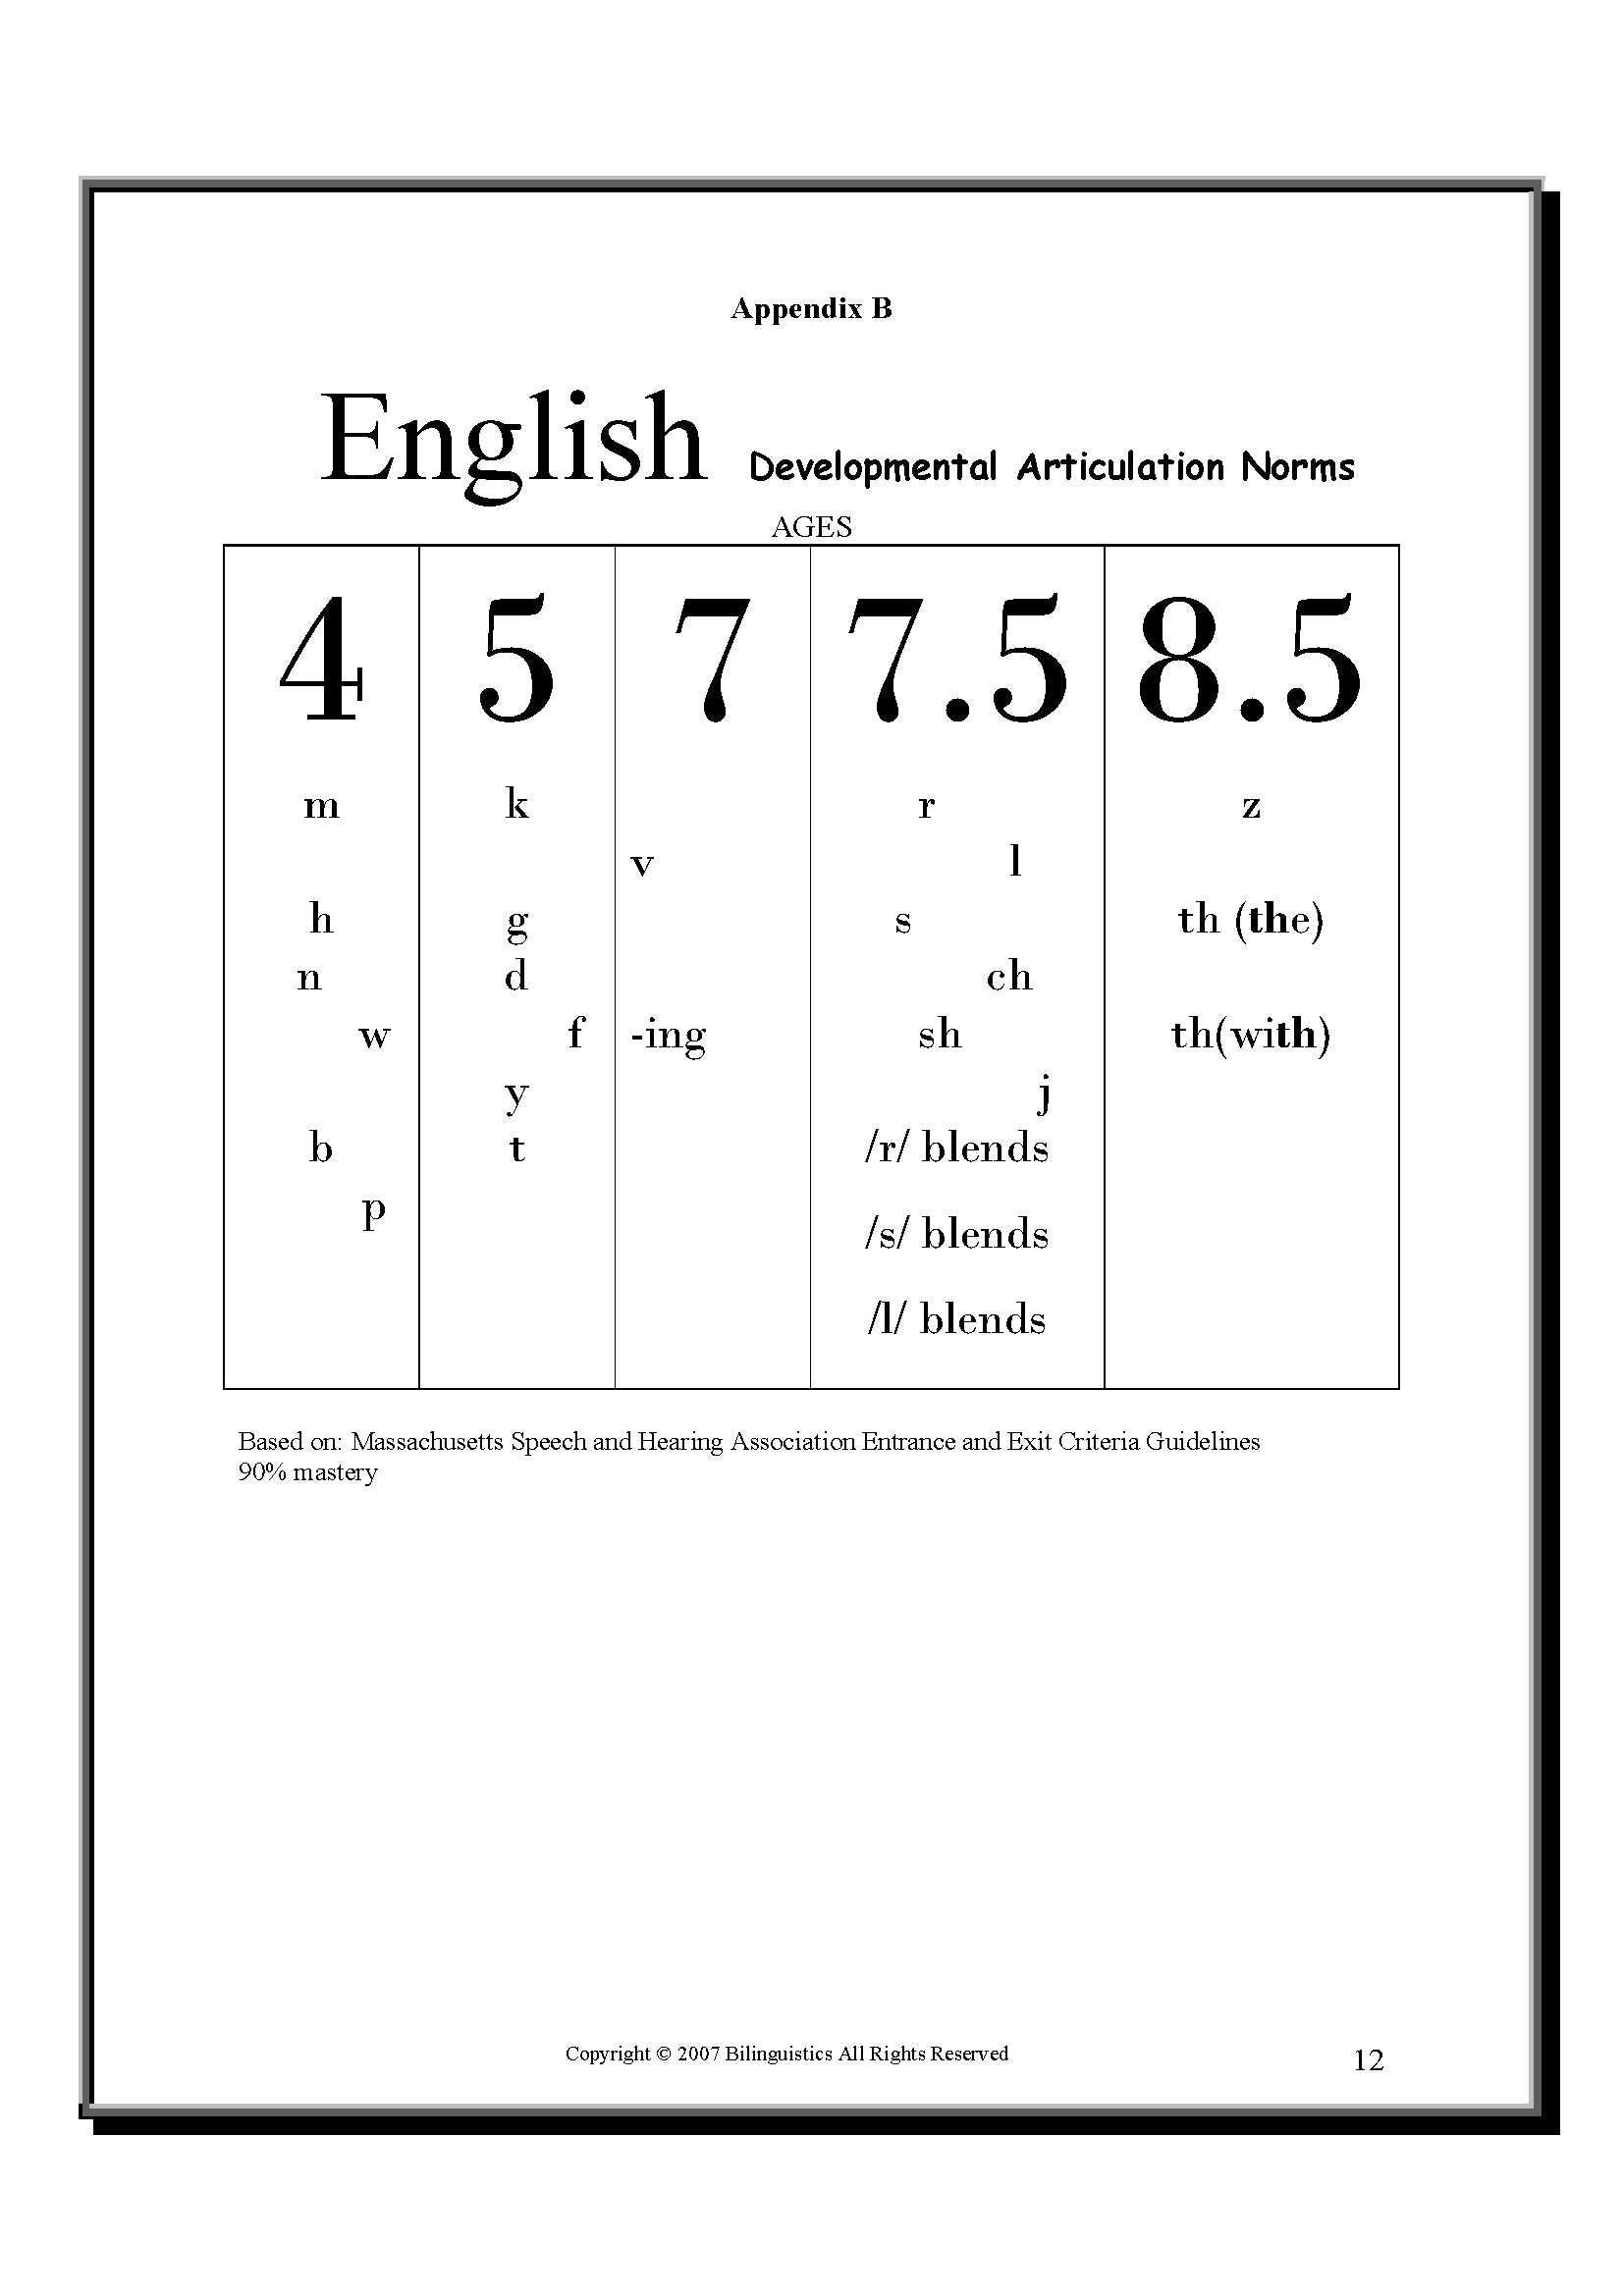 English Developmental Articulation Norms